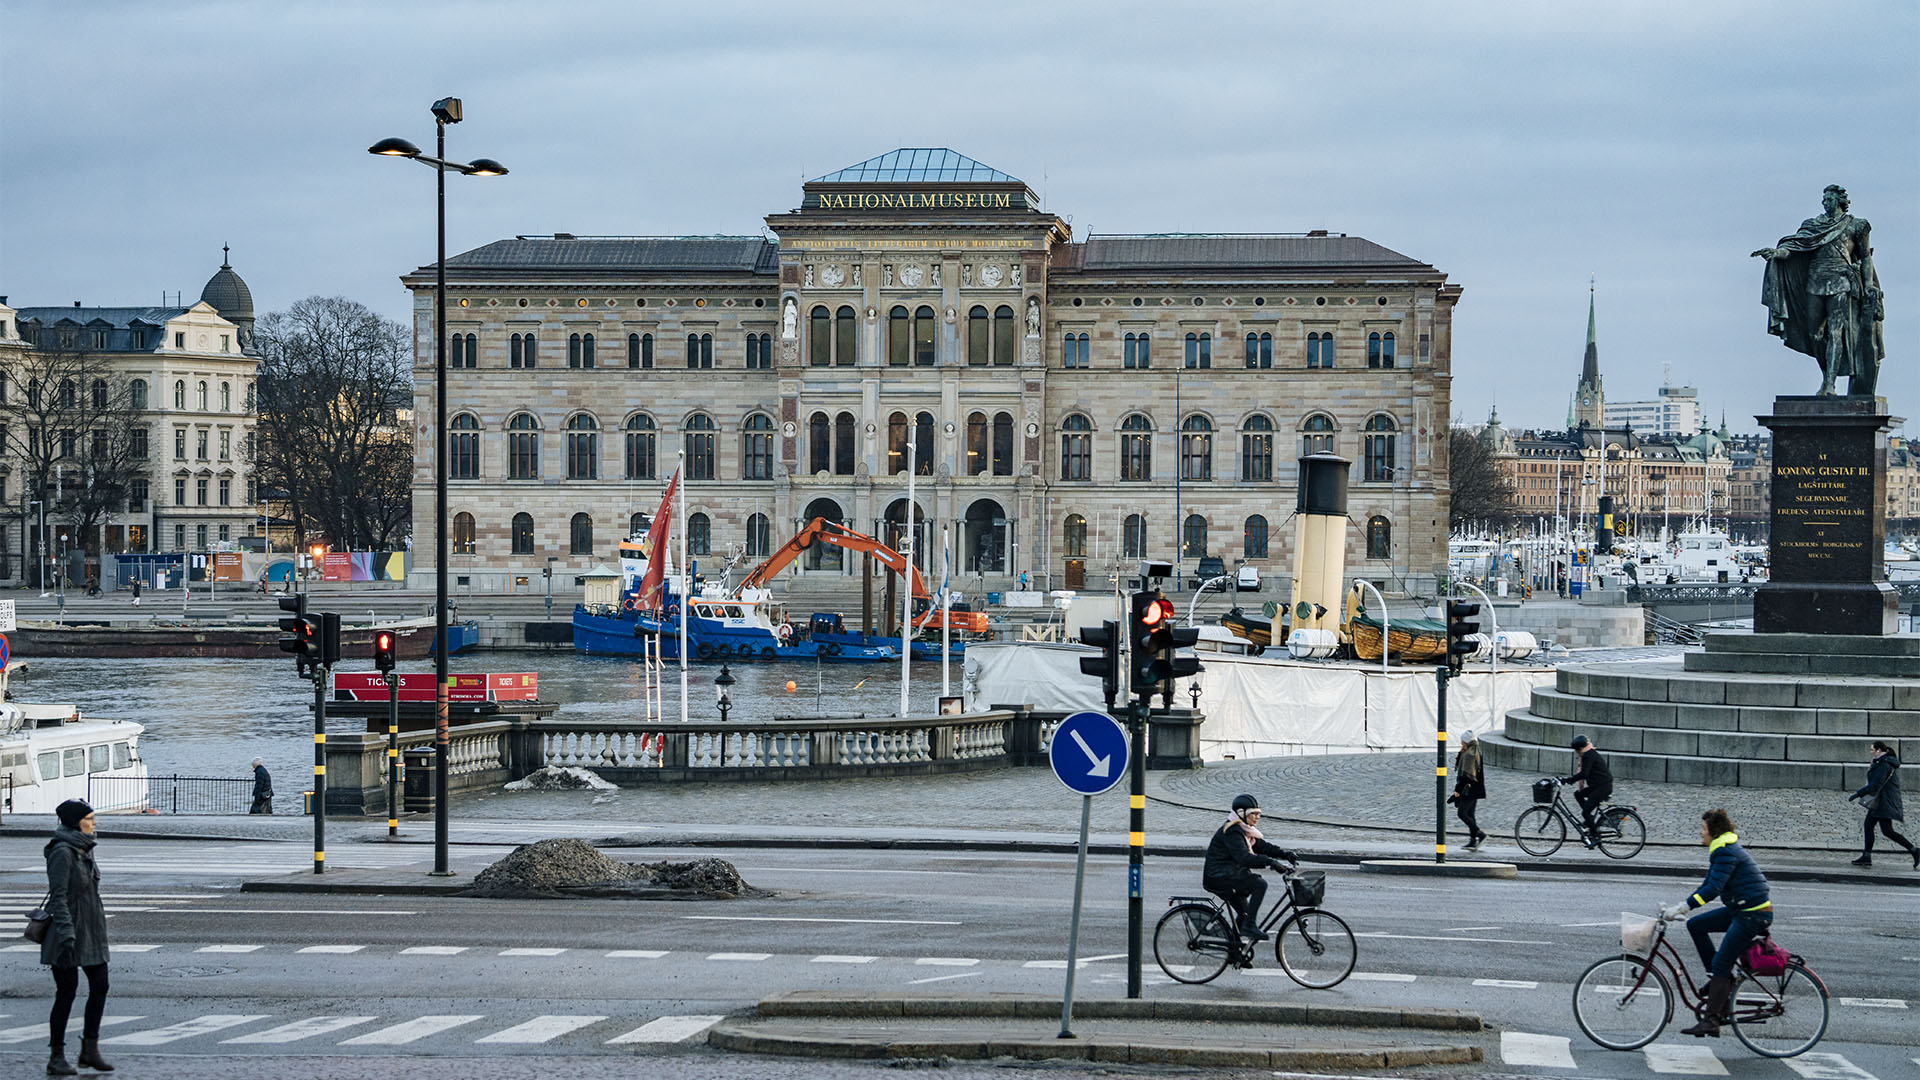 Ljus bild av stockholms ekonomi 3